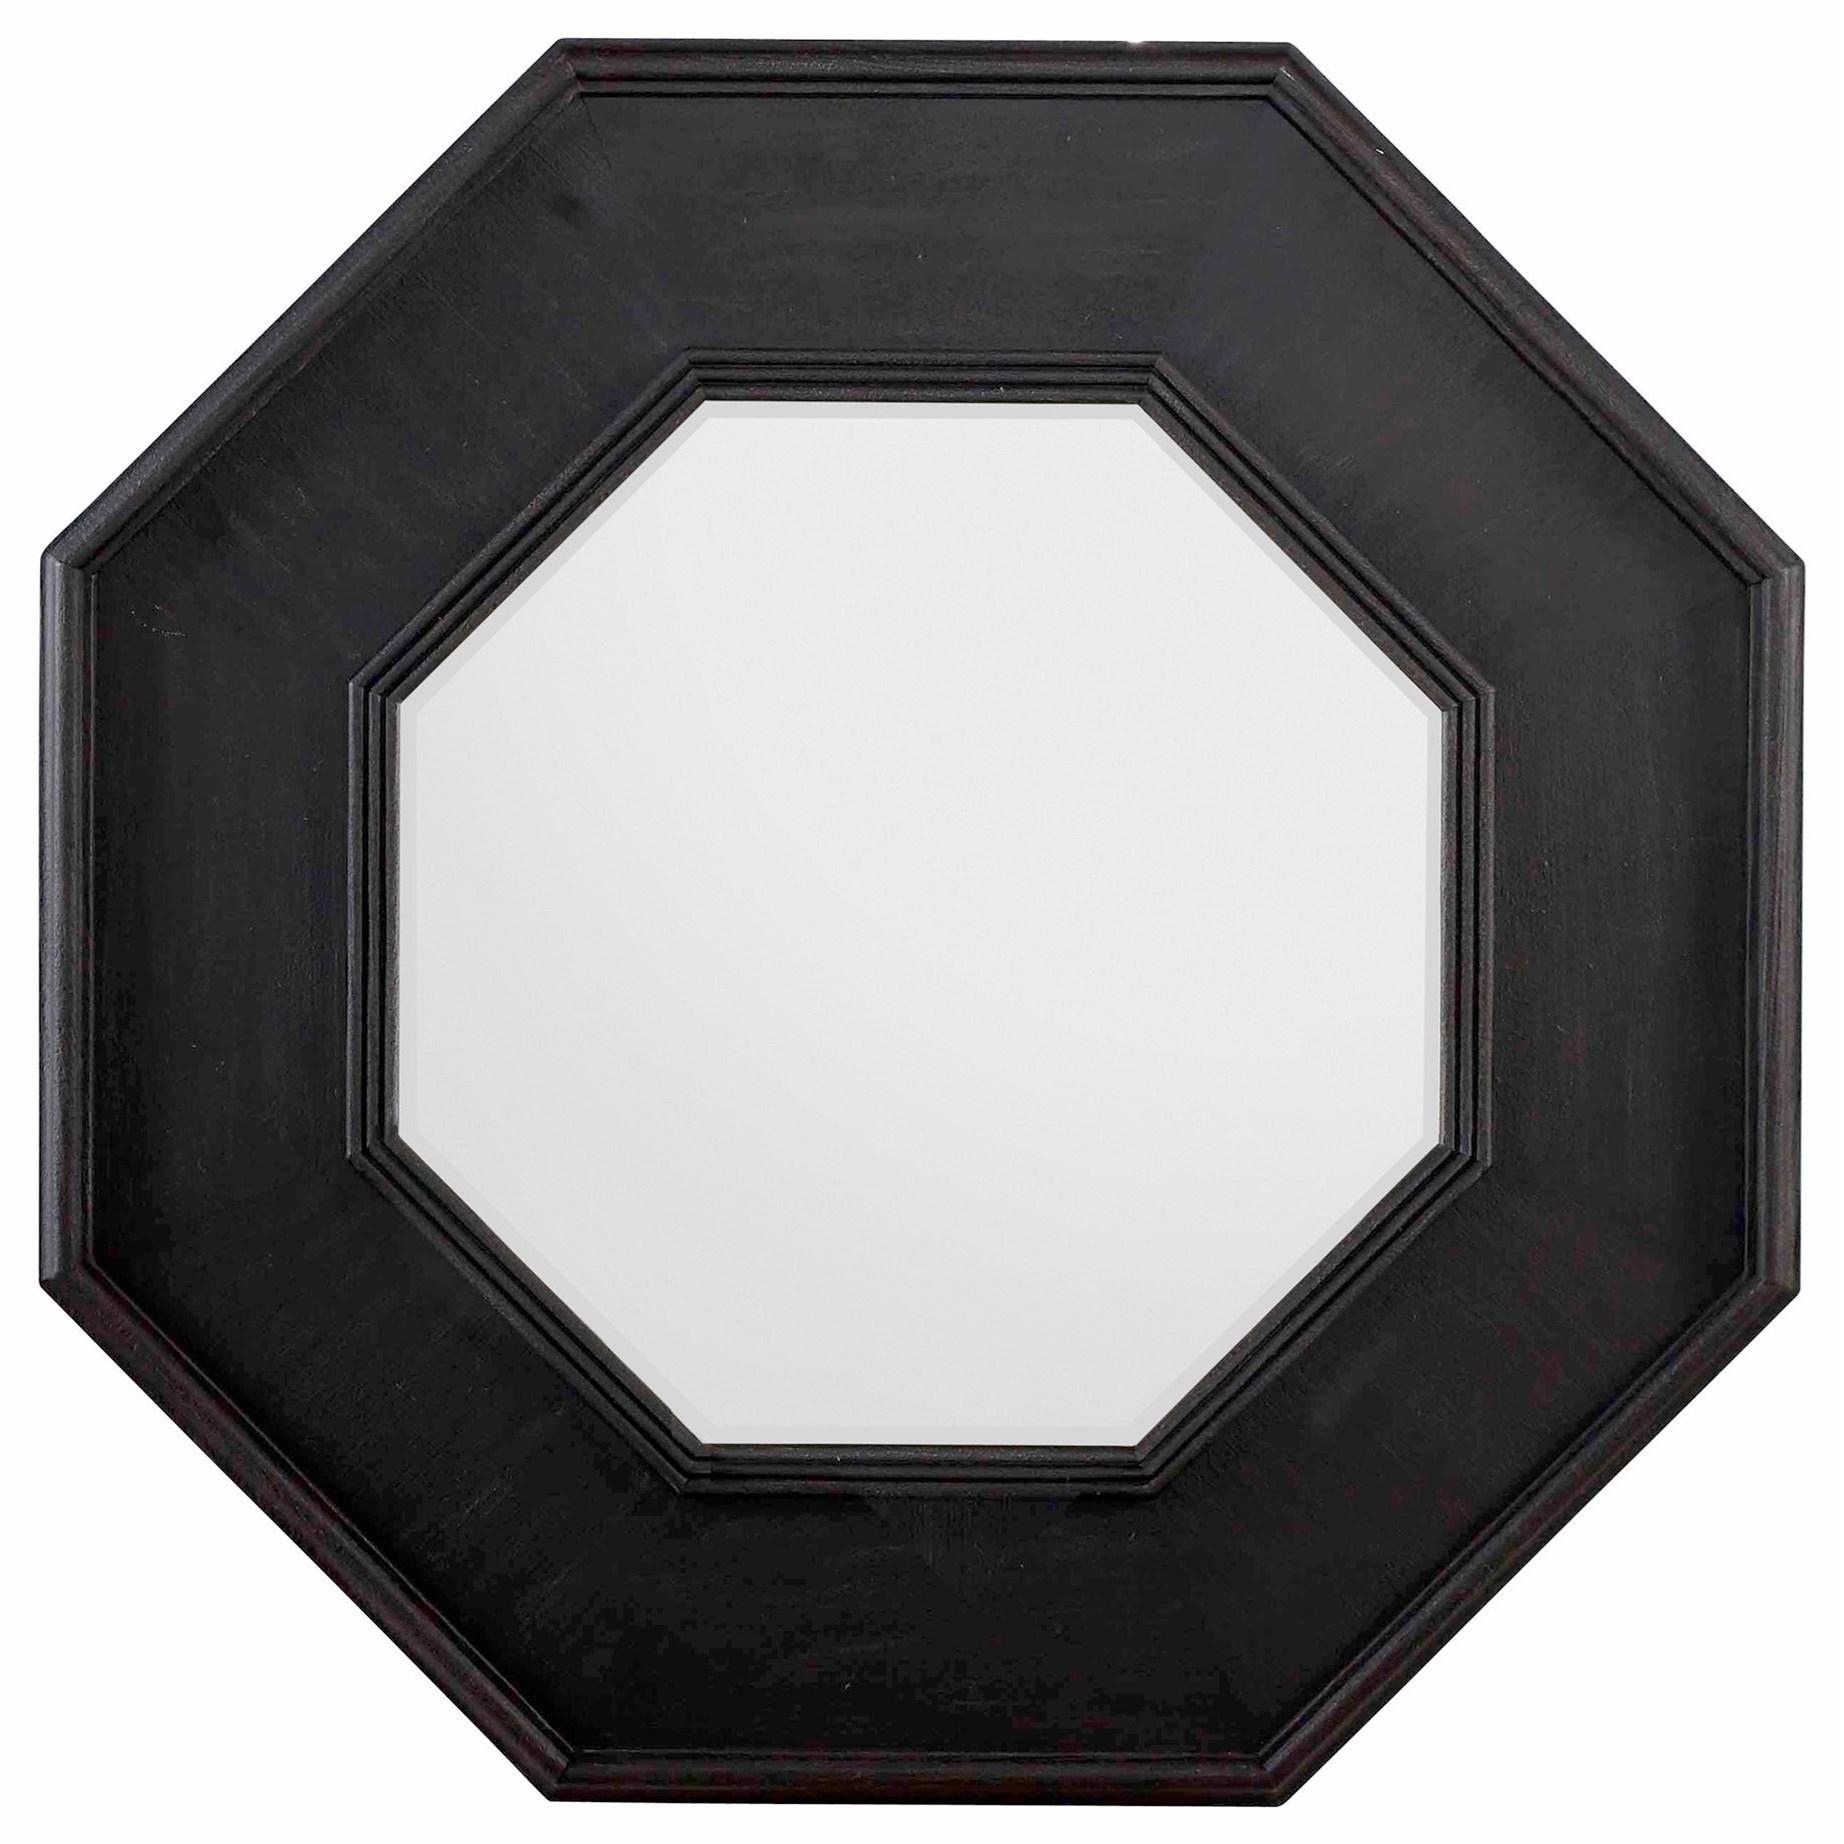 Hooker Furniture Saint Armand Hexagon Mirror - Item Number: 5602-90007